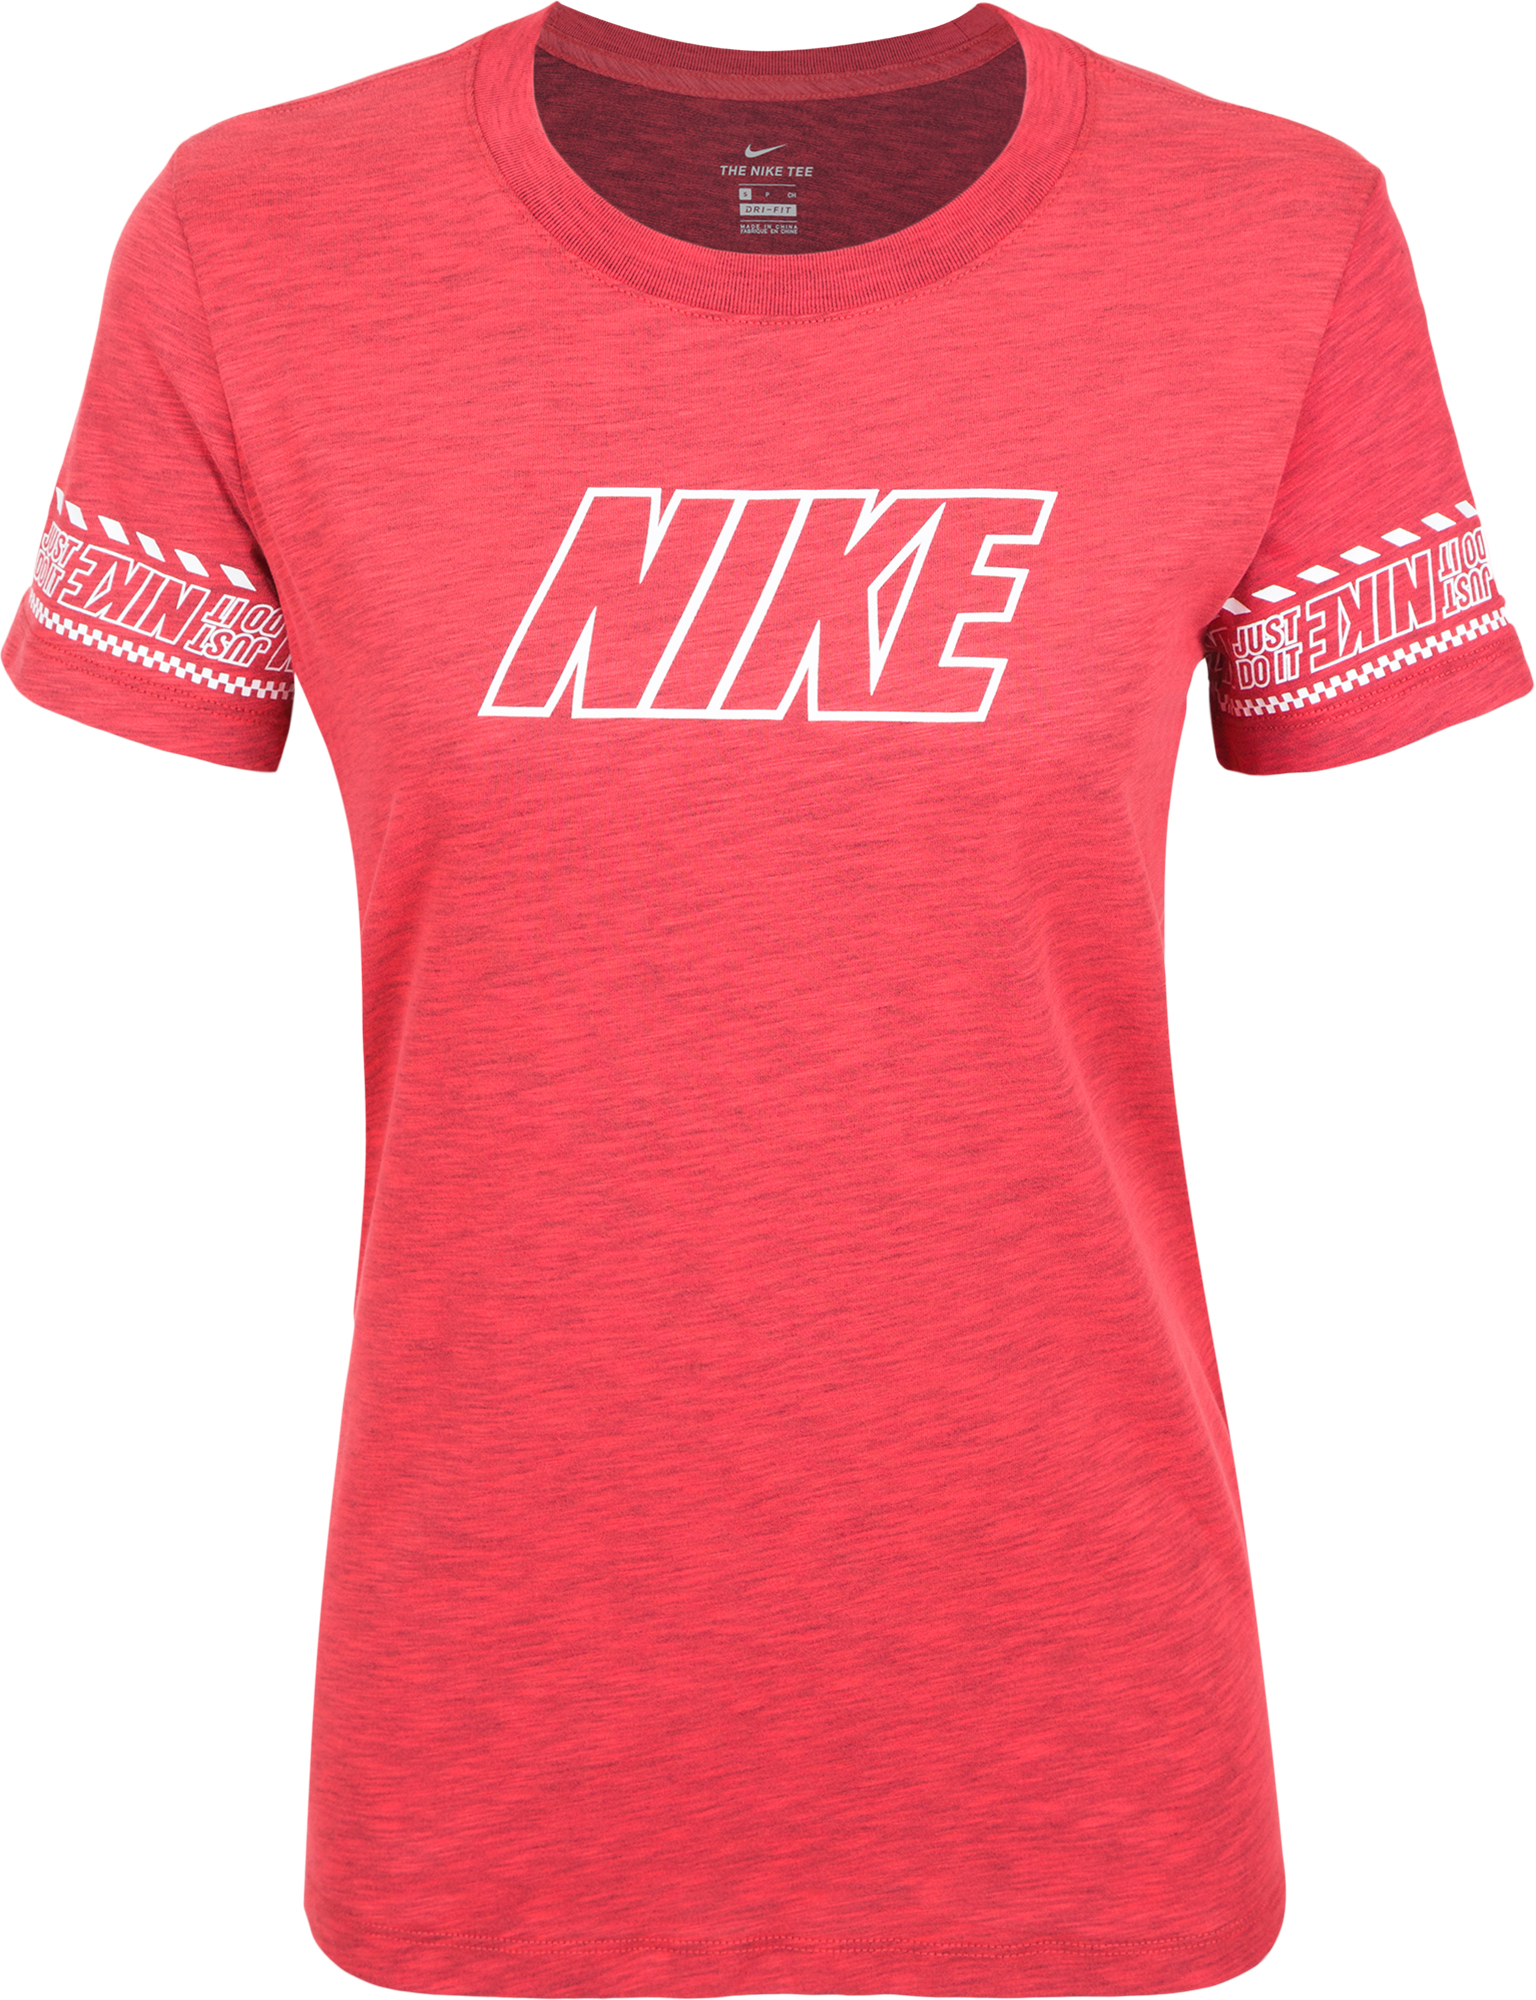 Nike Футболка женская  Dri-FIT, размер 48-50